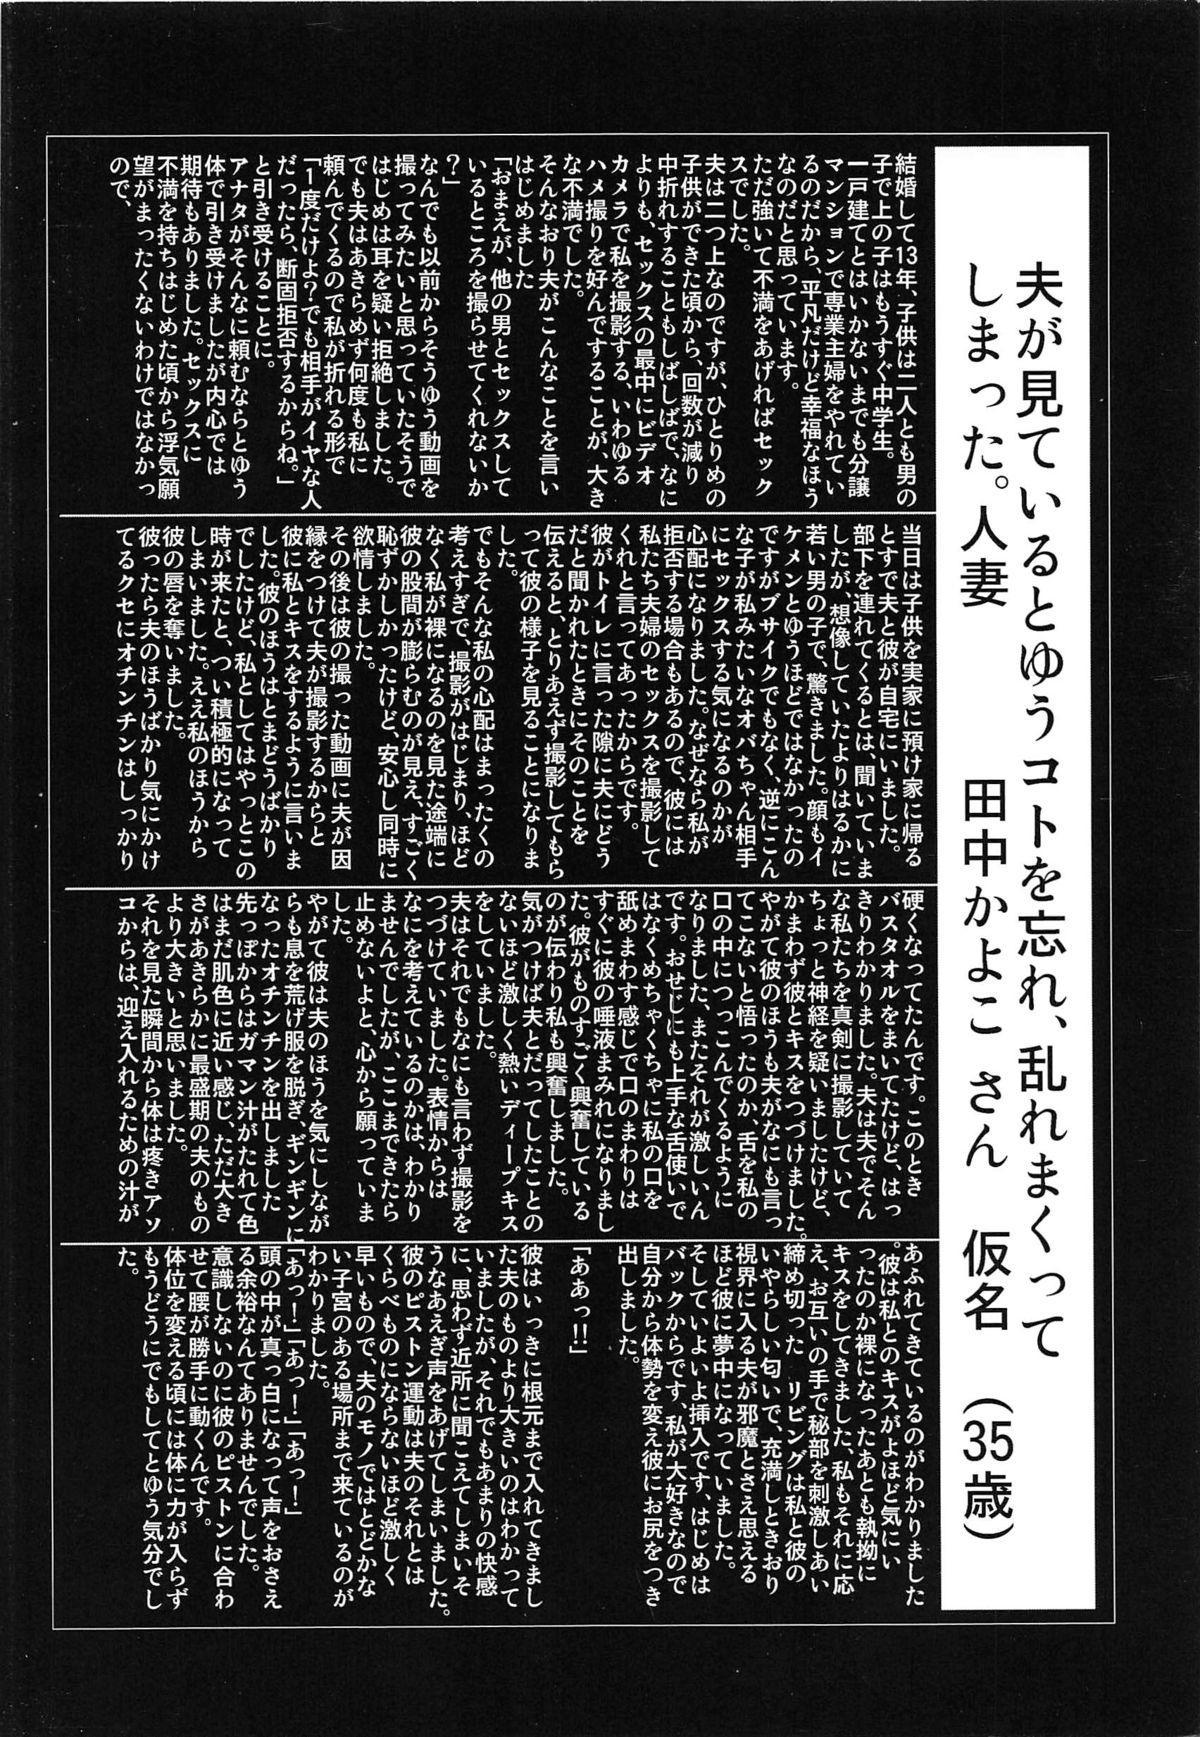 [Kuroki Hidehiko] 35 Sai Yarigoro Zuma   35-Year-Old Ripe Wife [English] {Tadanohito} 2